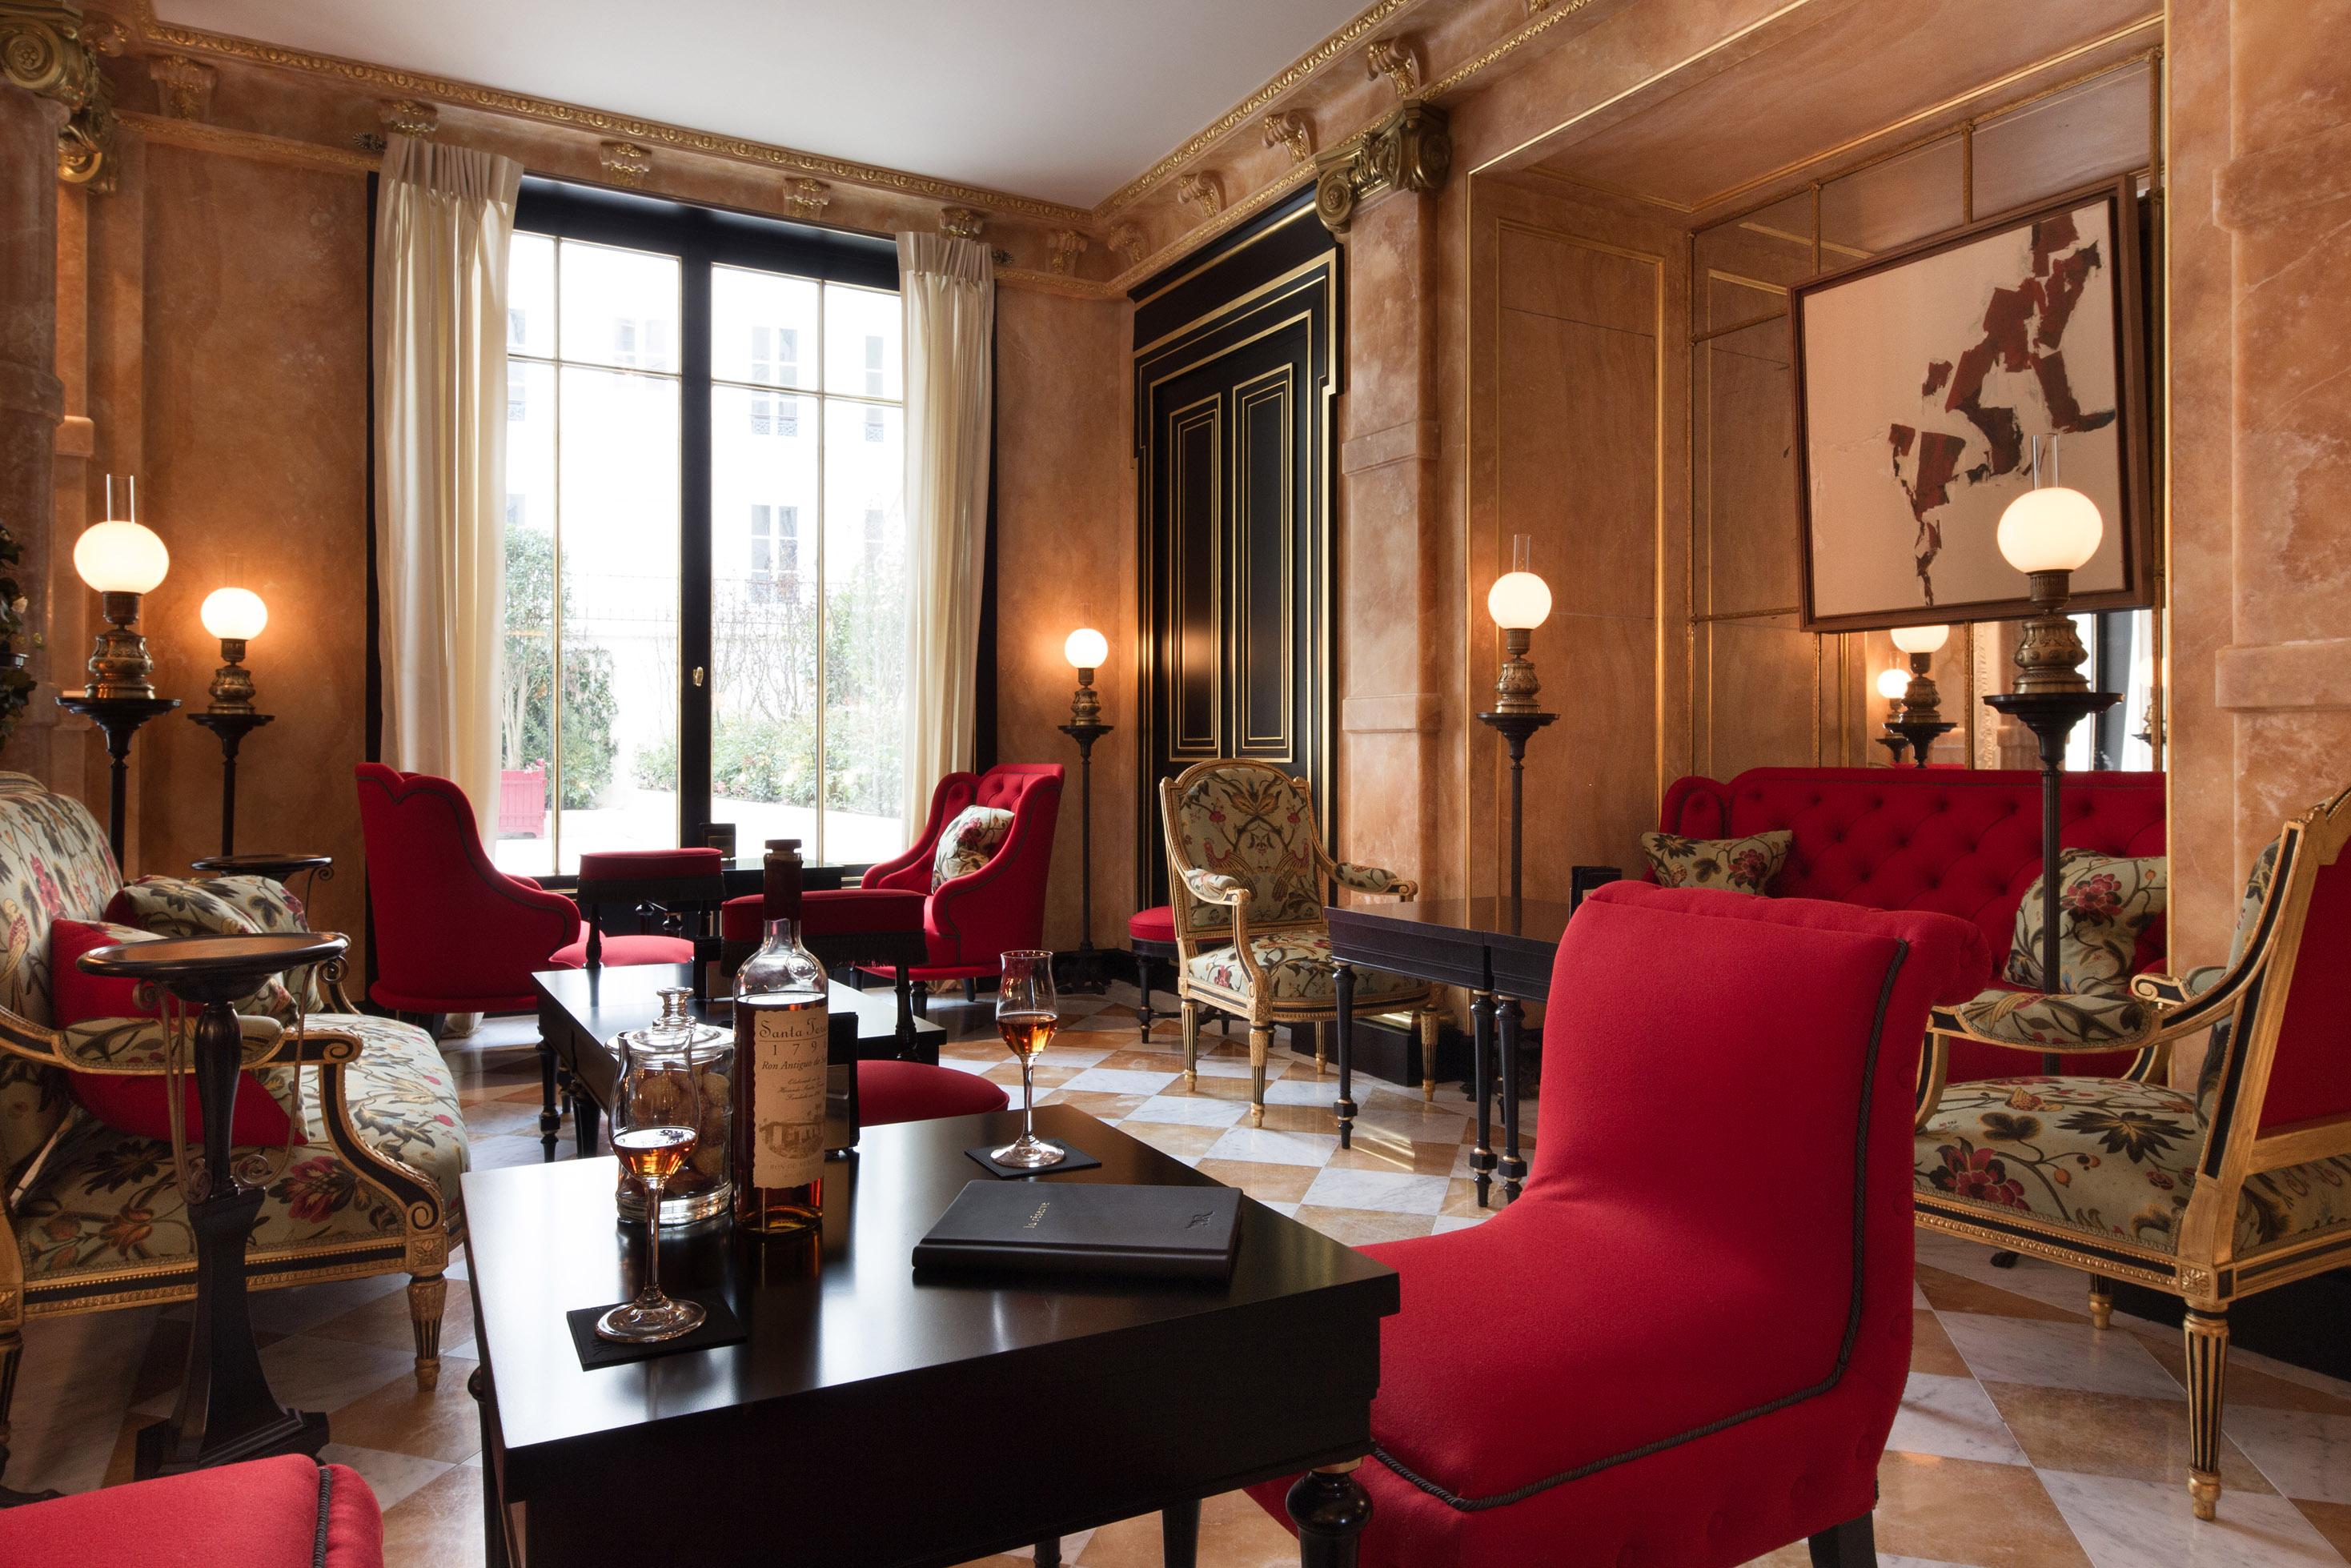 la r serve paris h tel spa the brothers 39 blog. Black Bedroom Furniture Sets. Home Design Ideas